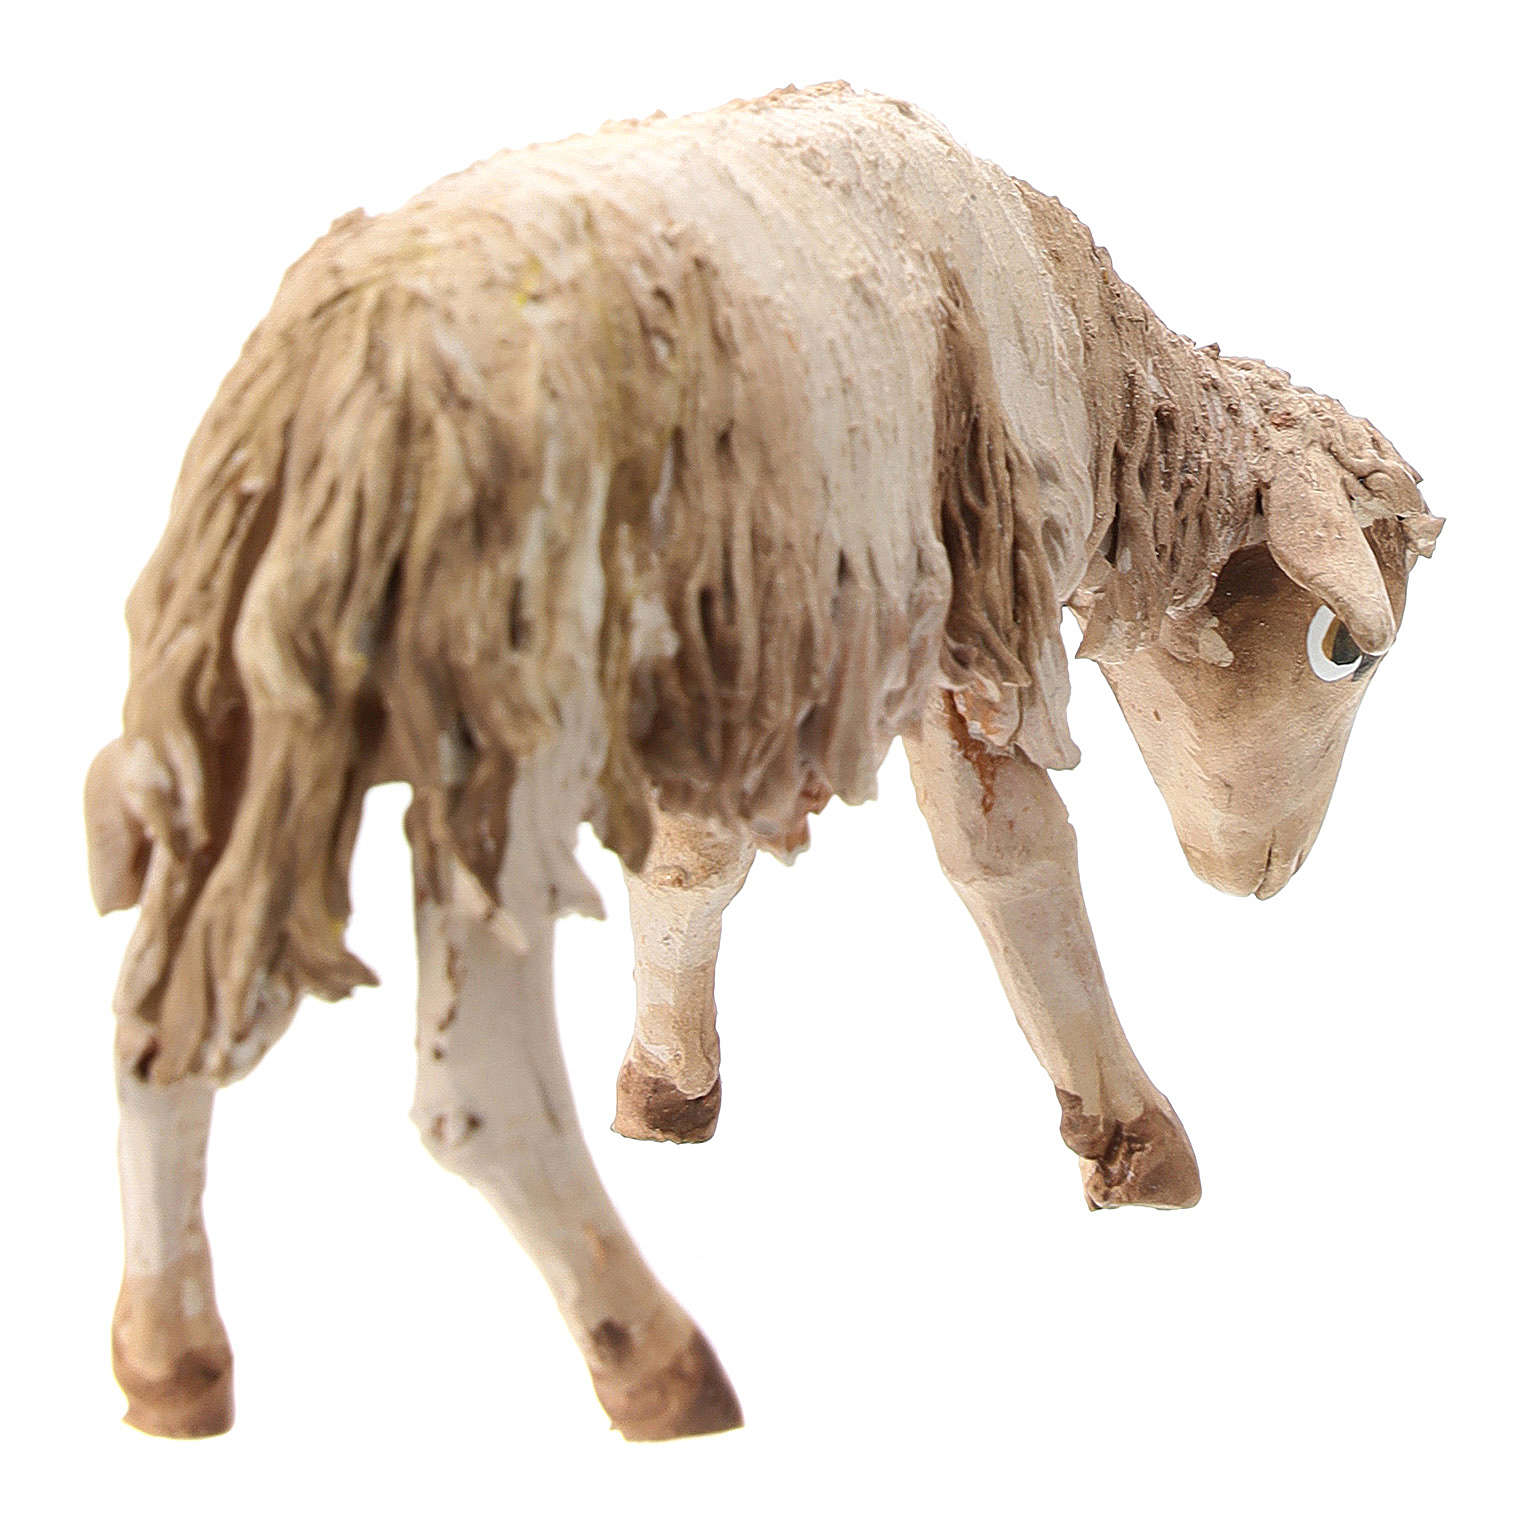 Nativity scene figurine, Sheep looking down by Angela Tripi 13 cm 4